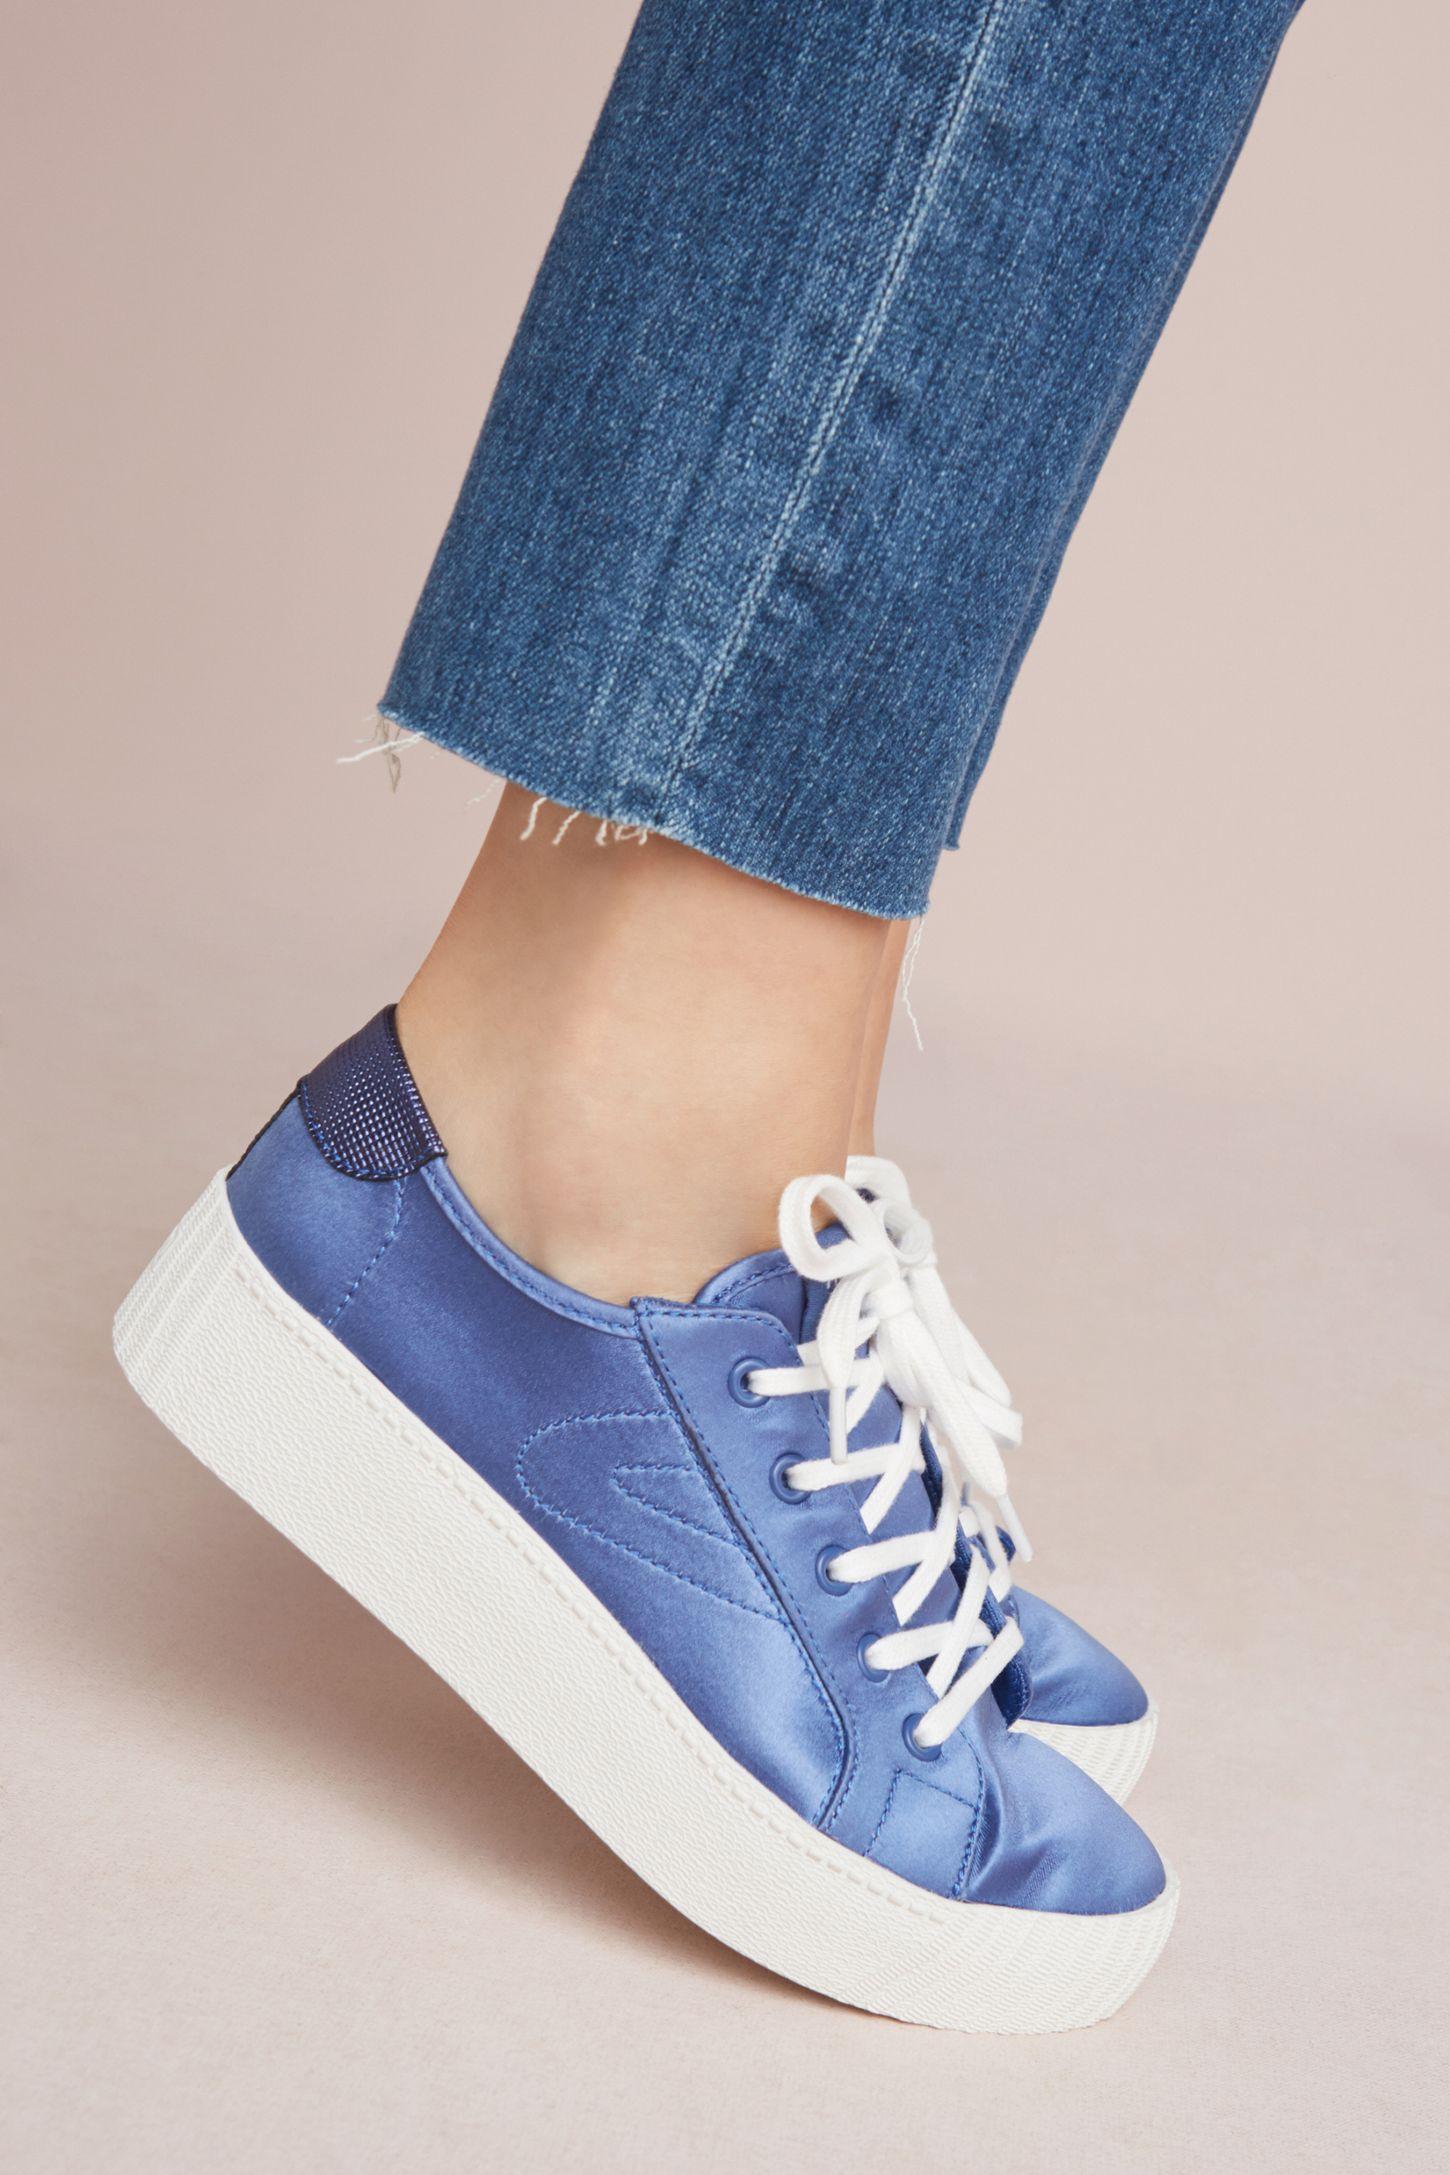 TRETORN Blaire Satin Sneakers BKYdix